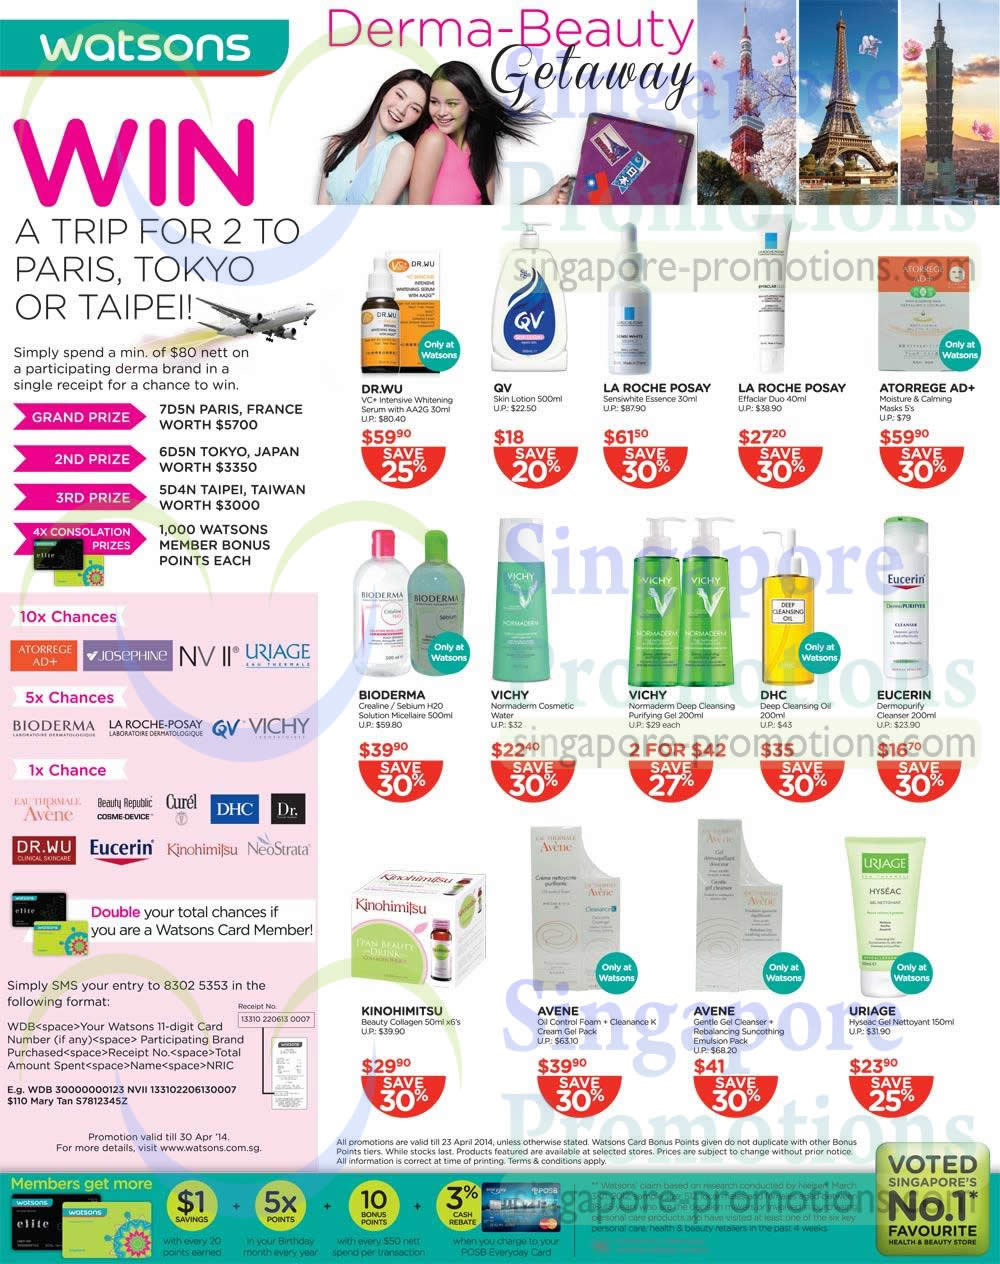 Beauty Bioderma, Vichy, DHC, Eucerin, Avene, Uriage, QV, La Roche Posay, Atorrege AD